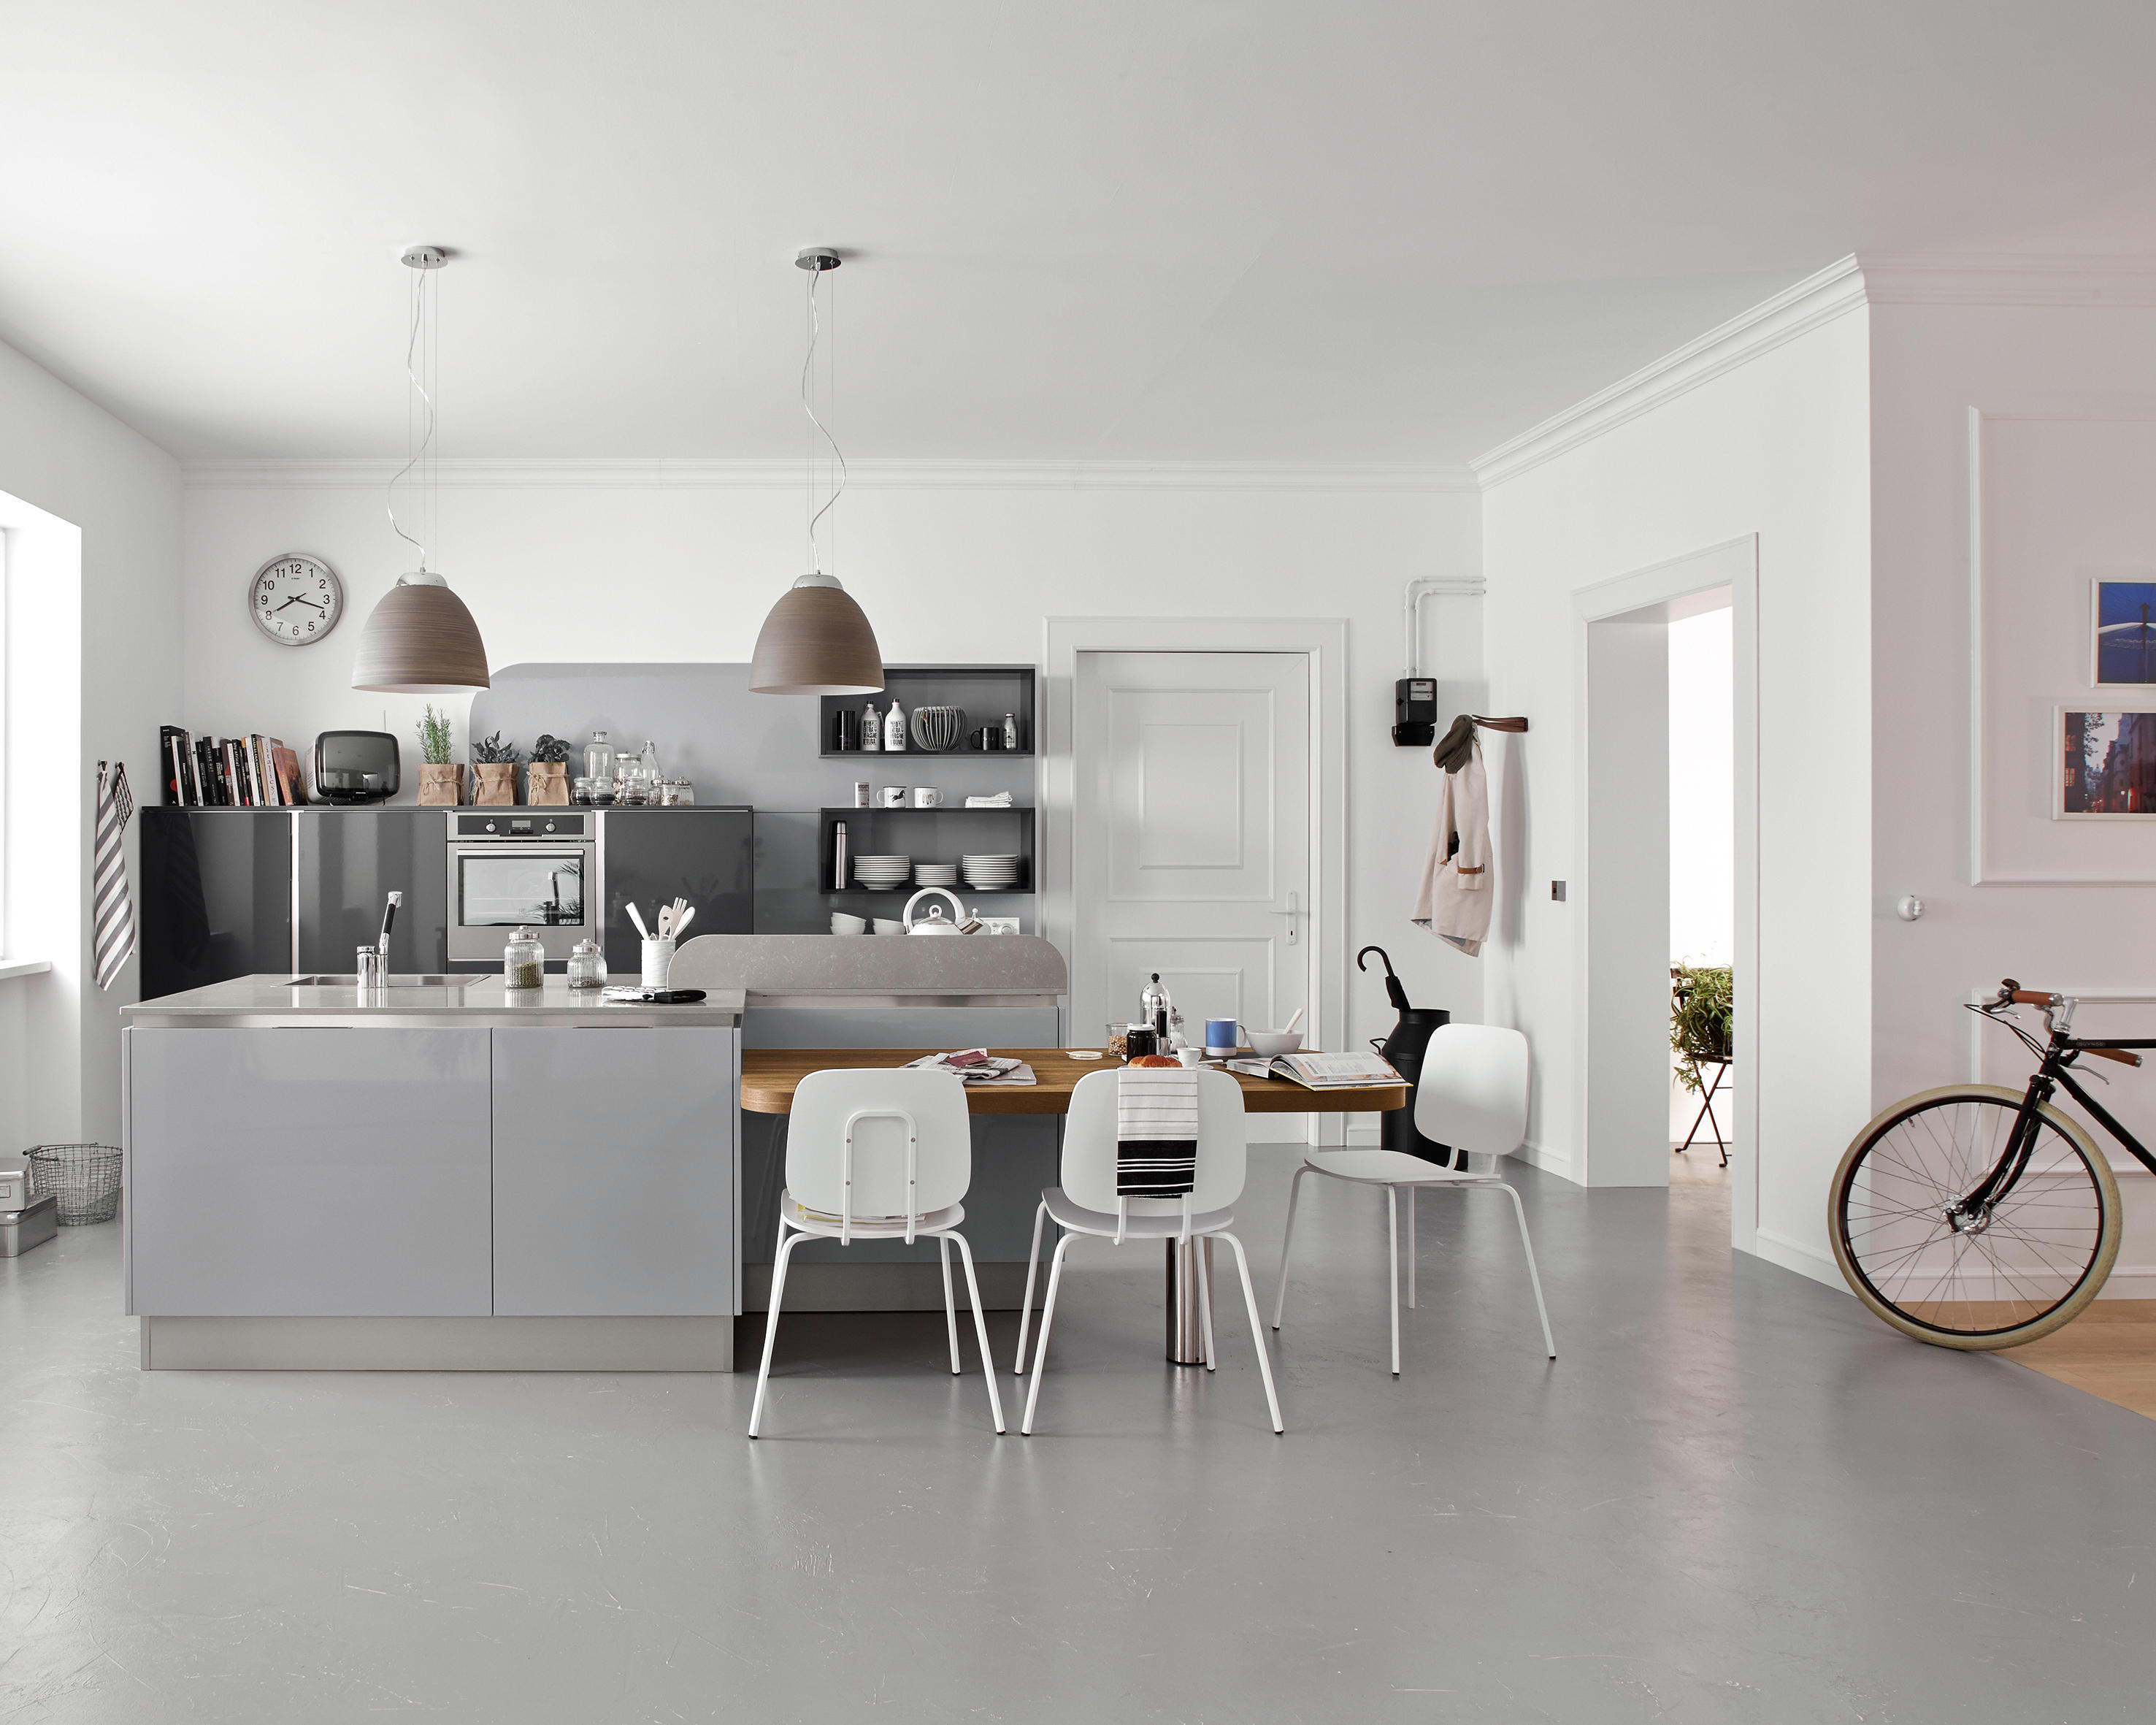 Cucine Carrera Veneta.Carrera Go Fitted Kitchens From Veneta Cucine Architonic